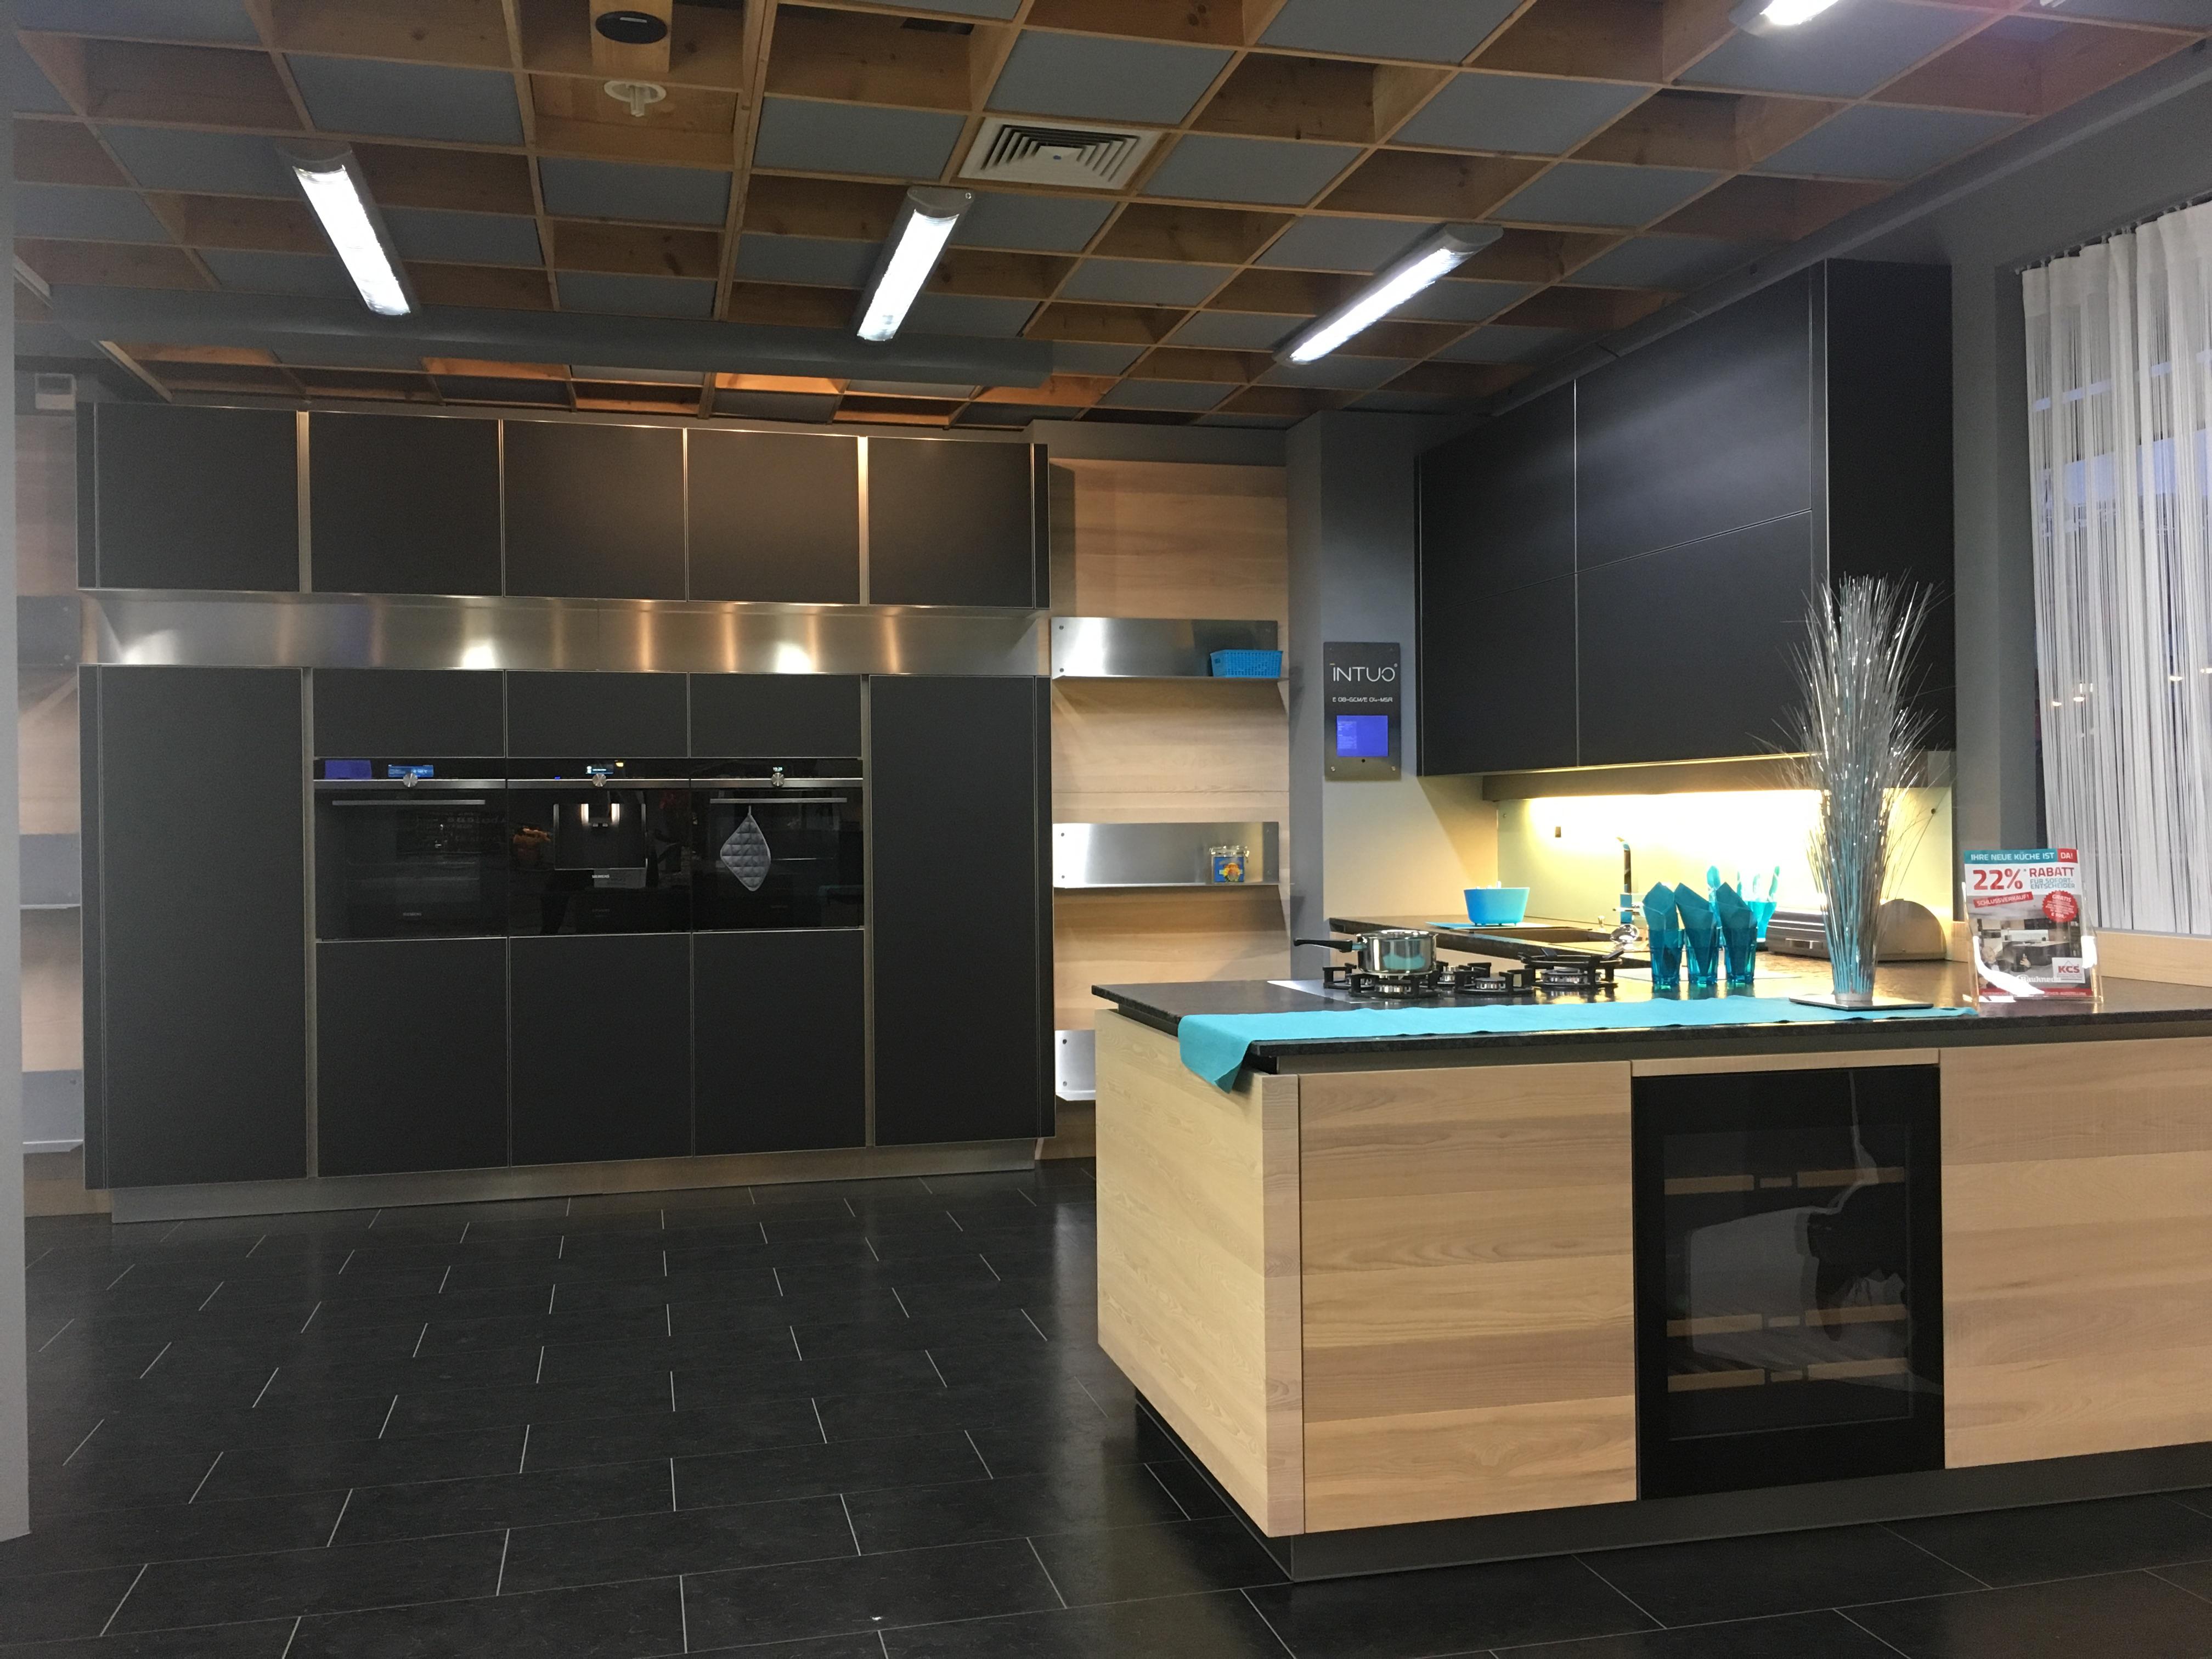 musterkchen verkauf individuell geplante kchen und musterkchen with musterkchen verkauf. Black Bedroom Furniture Sets. Home Design Ideas